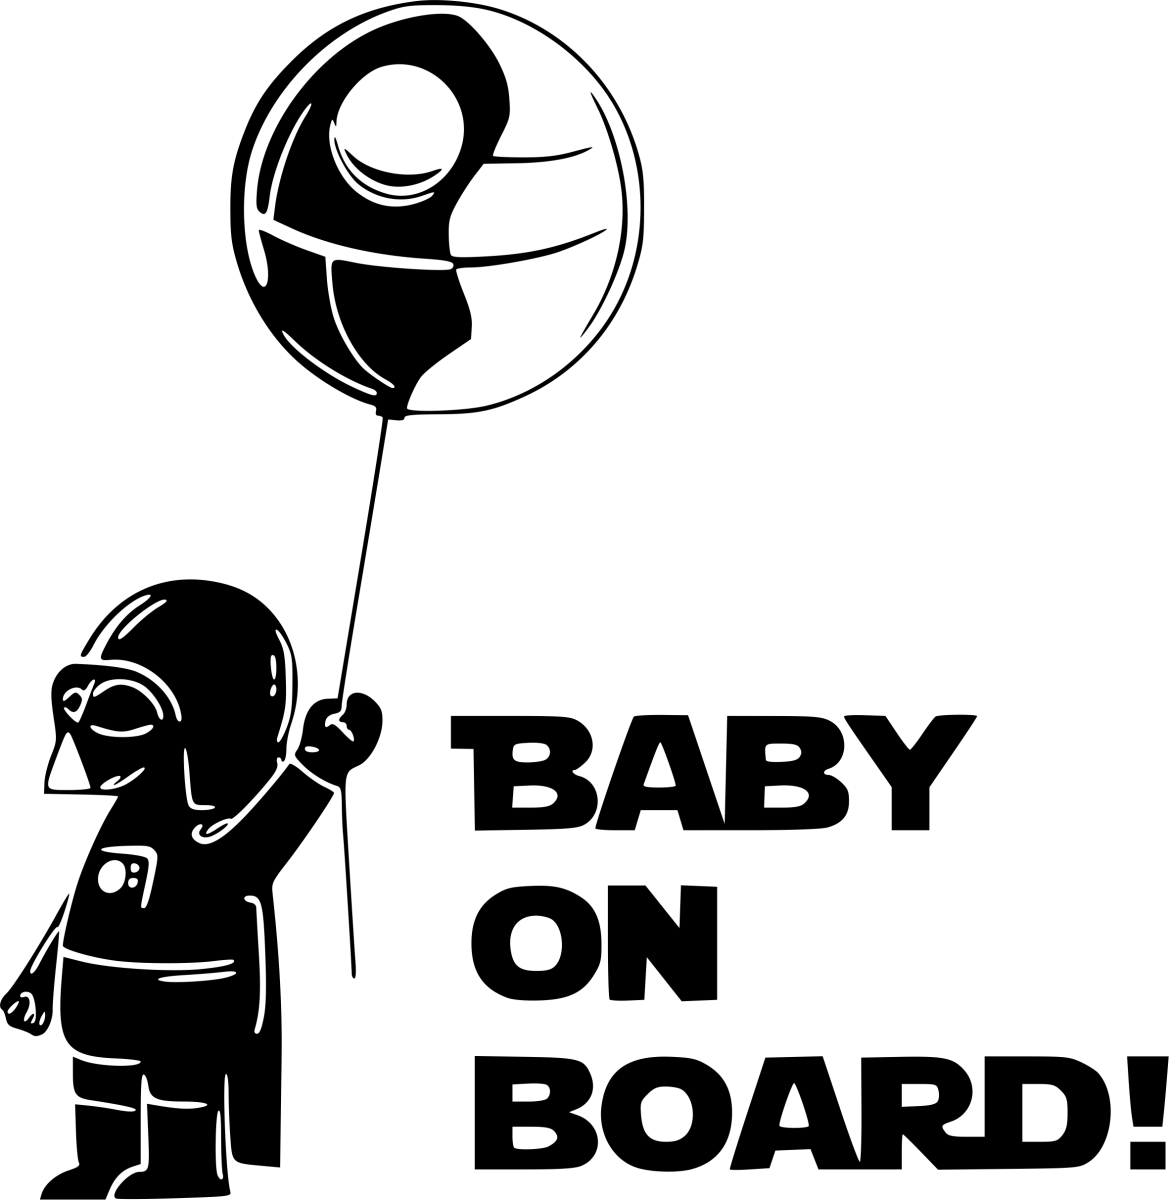 Star Wars Baby On Board Sticker Decal Bumper